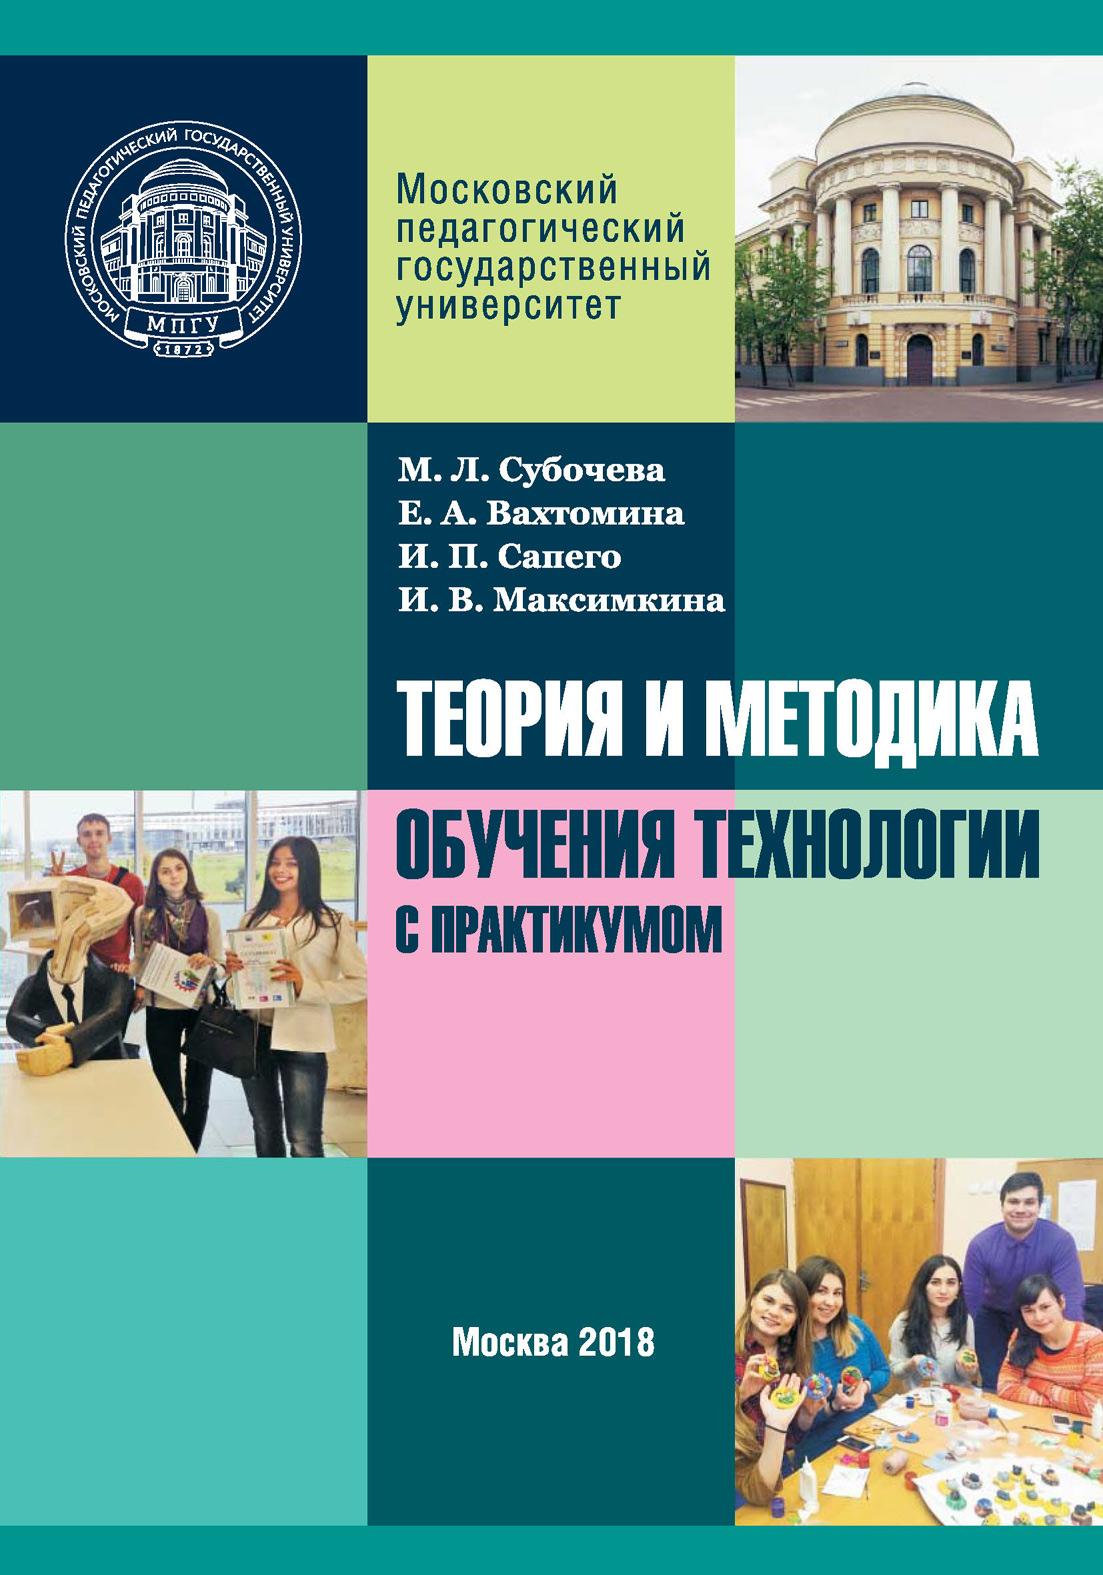 М. Л. Субочева Теория и методика обучения технологии с практикумом